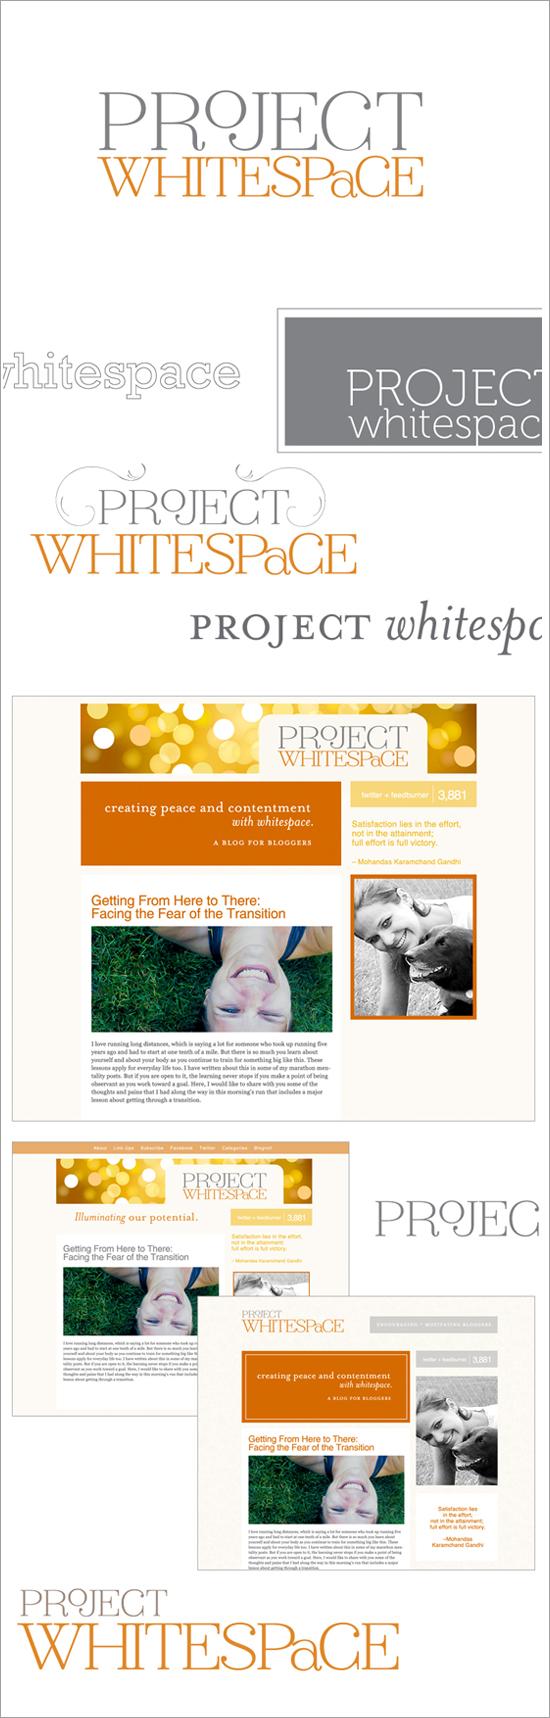 projectwhitespace copy